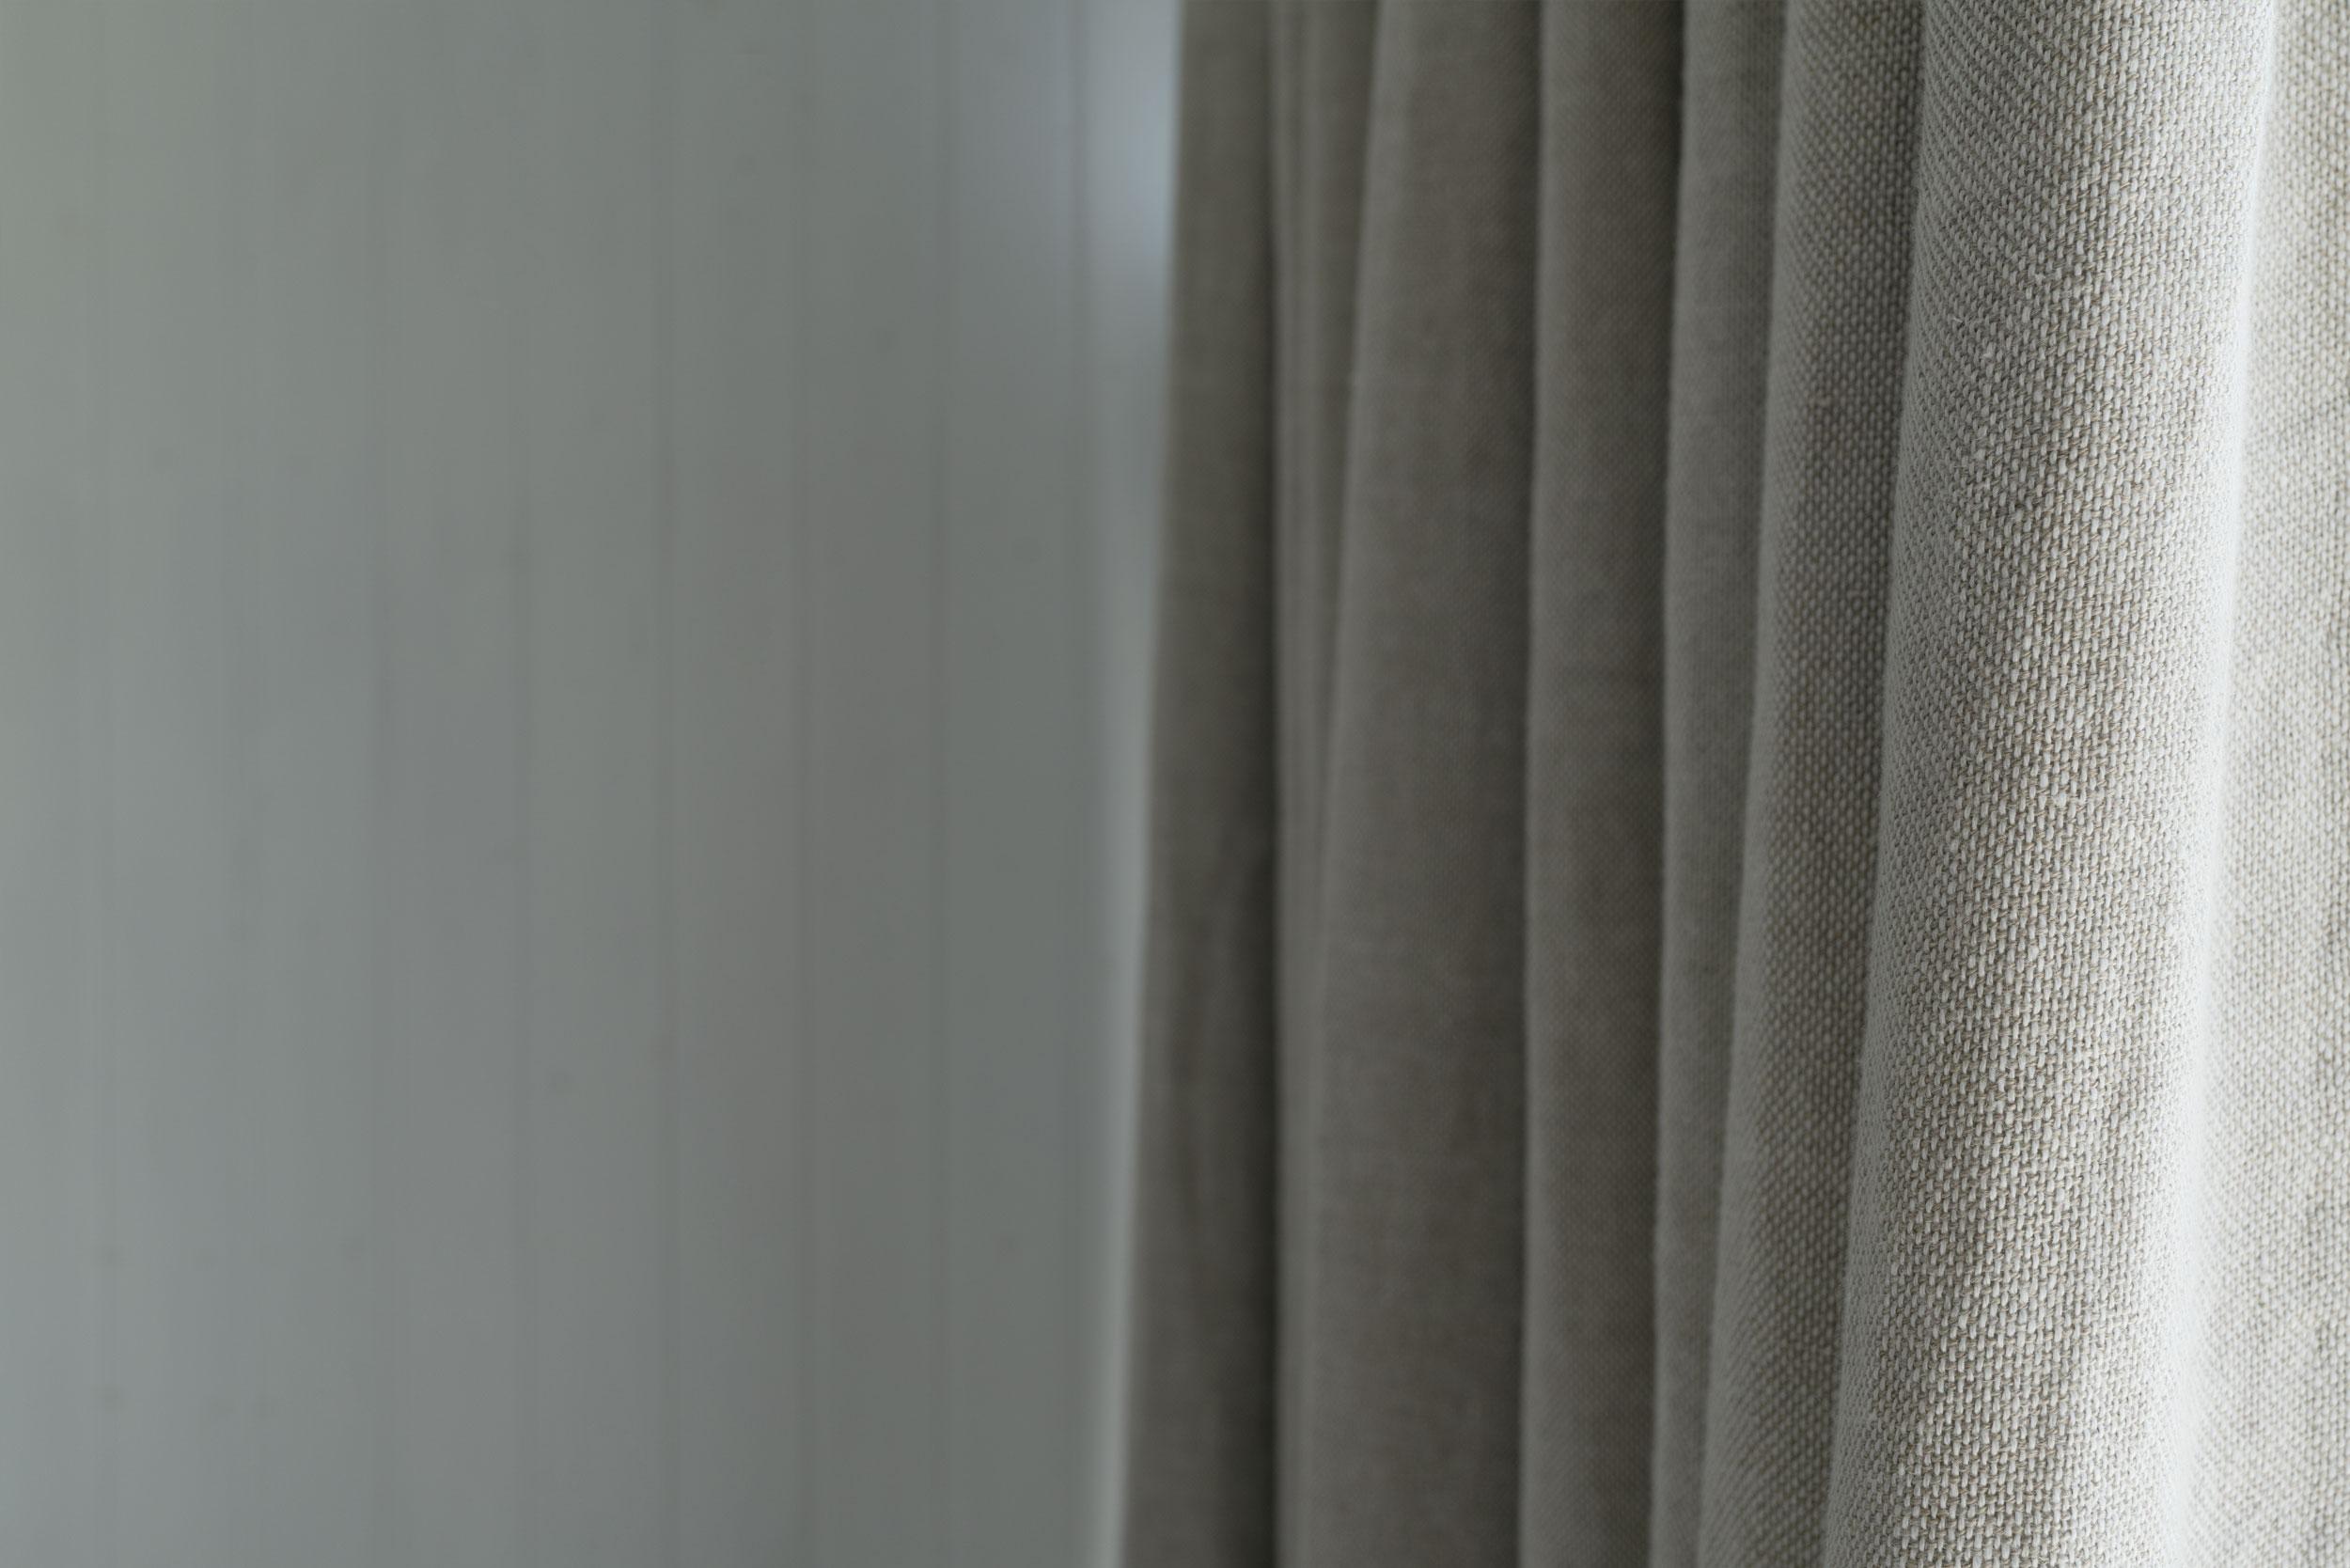 Casa-La-Siesta-Spain-Fiona-Burrage-Photography-curtains.jpg